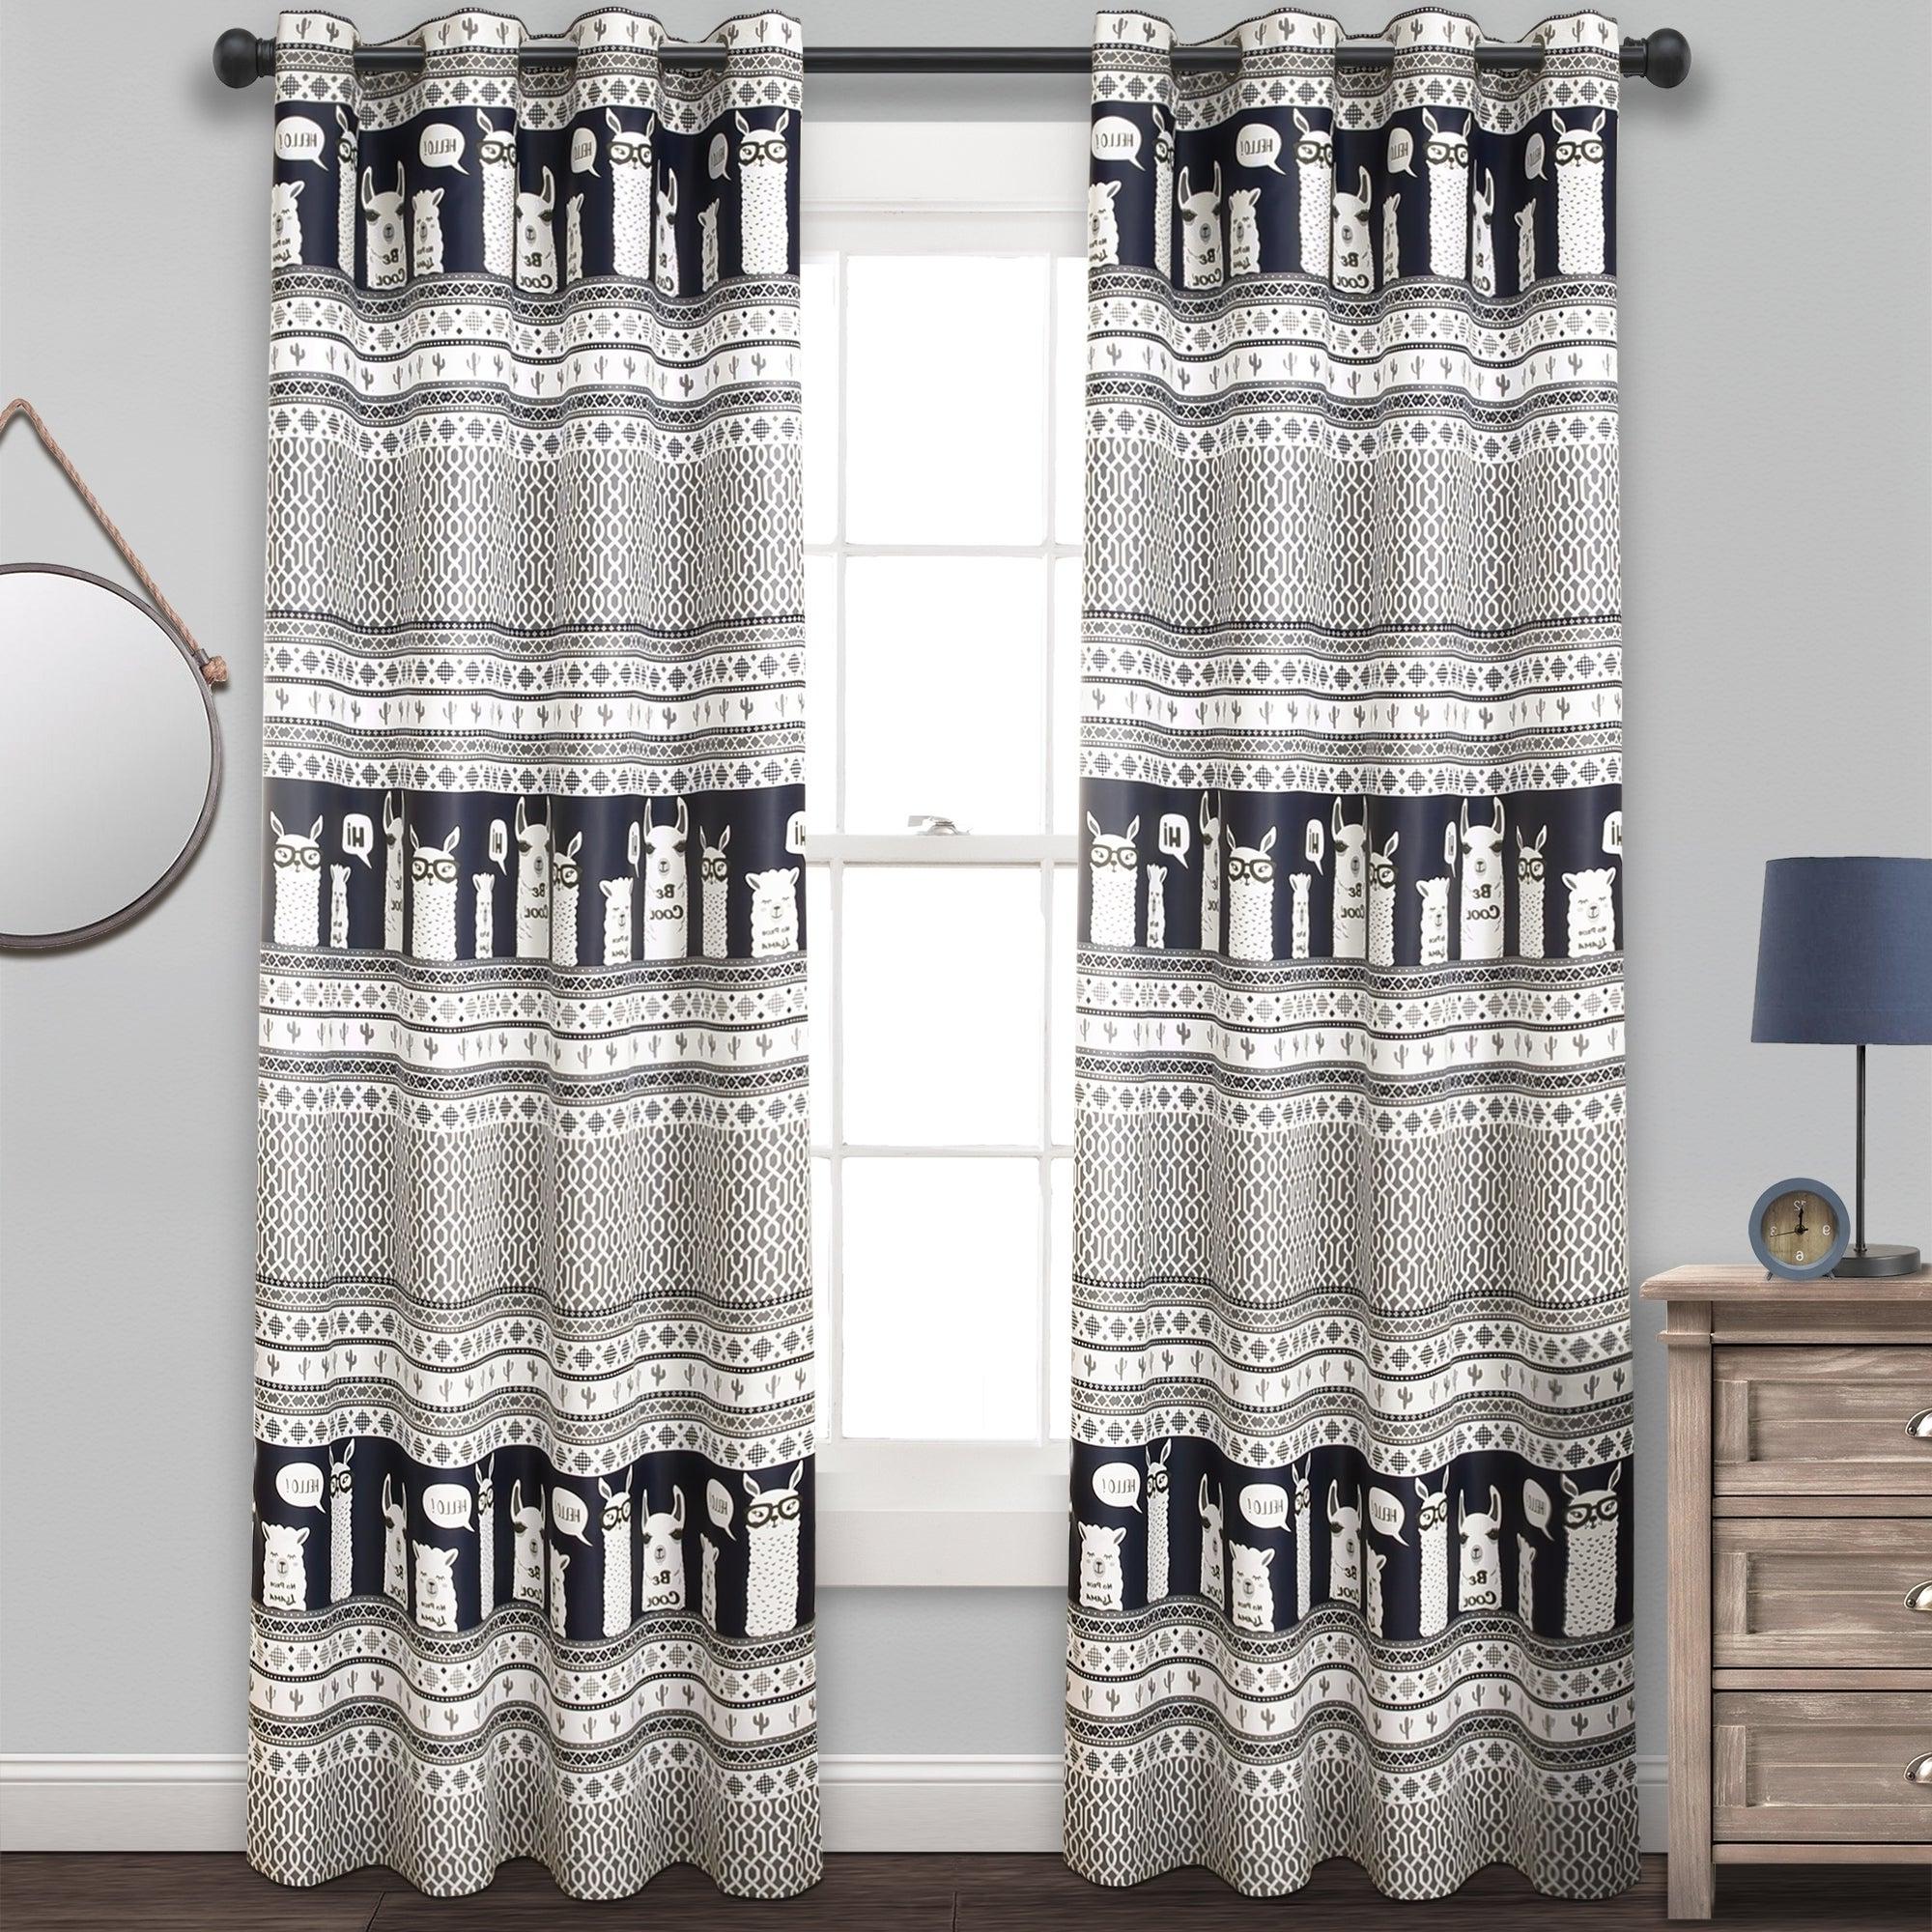 Details About Lush Decor Llama Stripe Room Darkening Window Curtain Panel Pertaining To Preferred Julia Striped Room Darkening Window Curtain Panel Pairs (View 10 of 20)